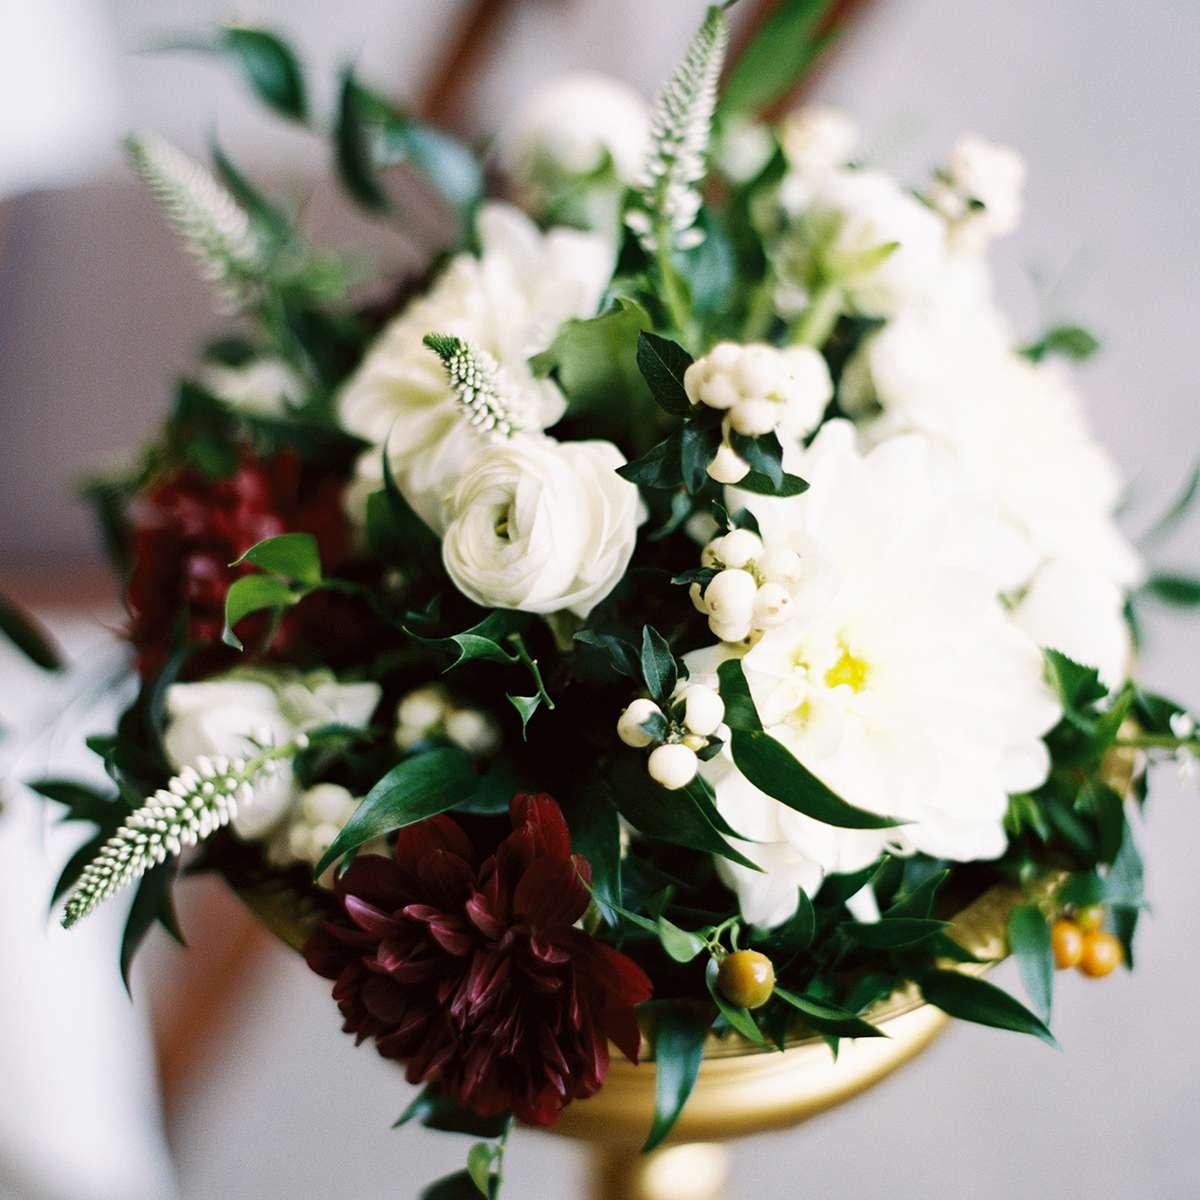 flowers in centerpiece